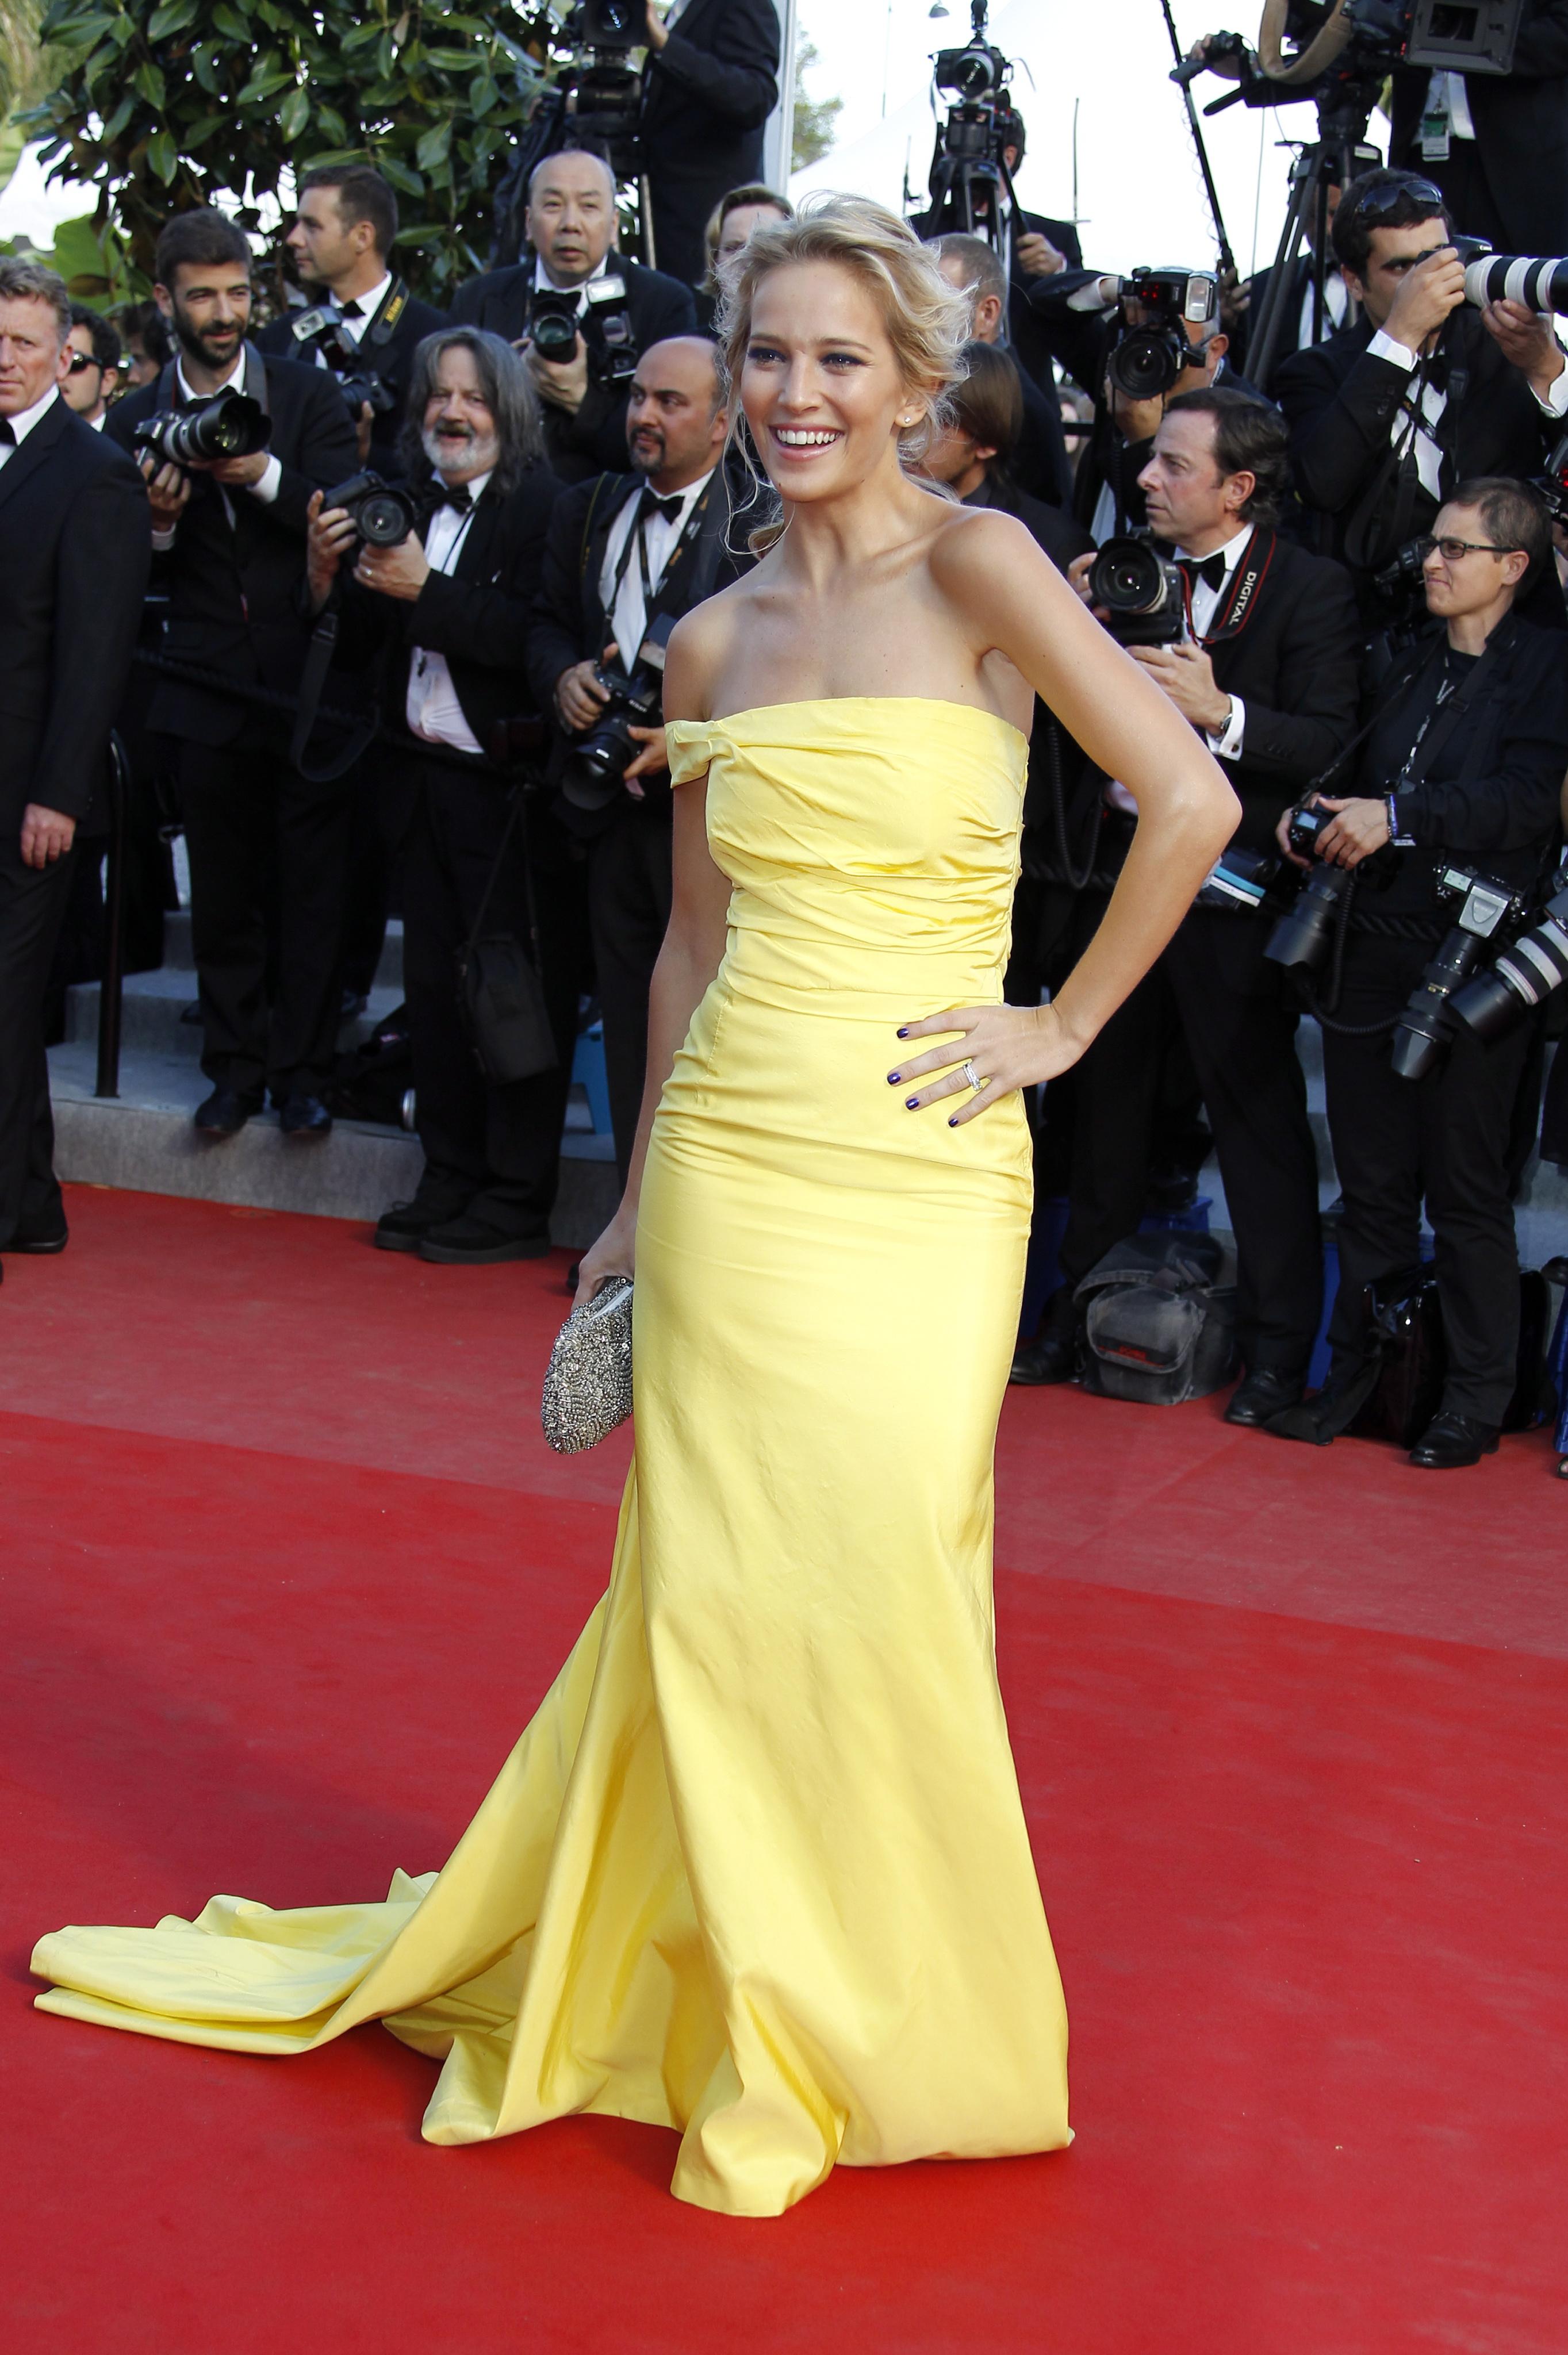 939818778_Luisana_Lopilato_On_The_Road_Premiere_Cannes9_122_478lo.jpg